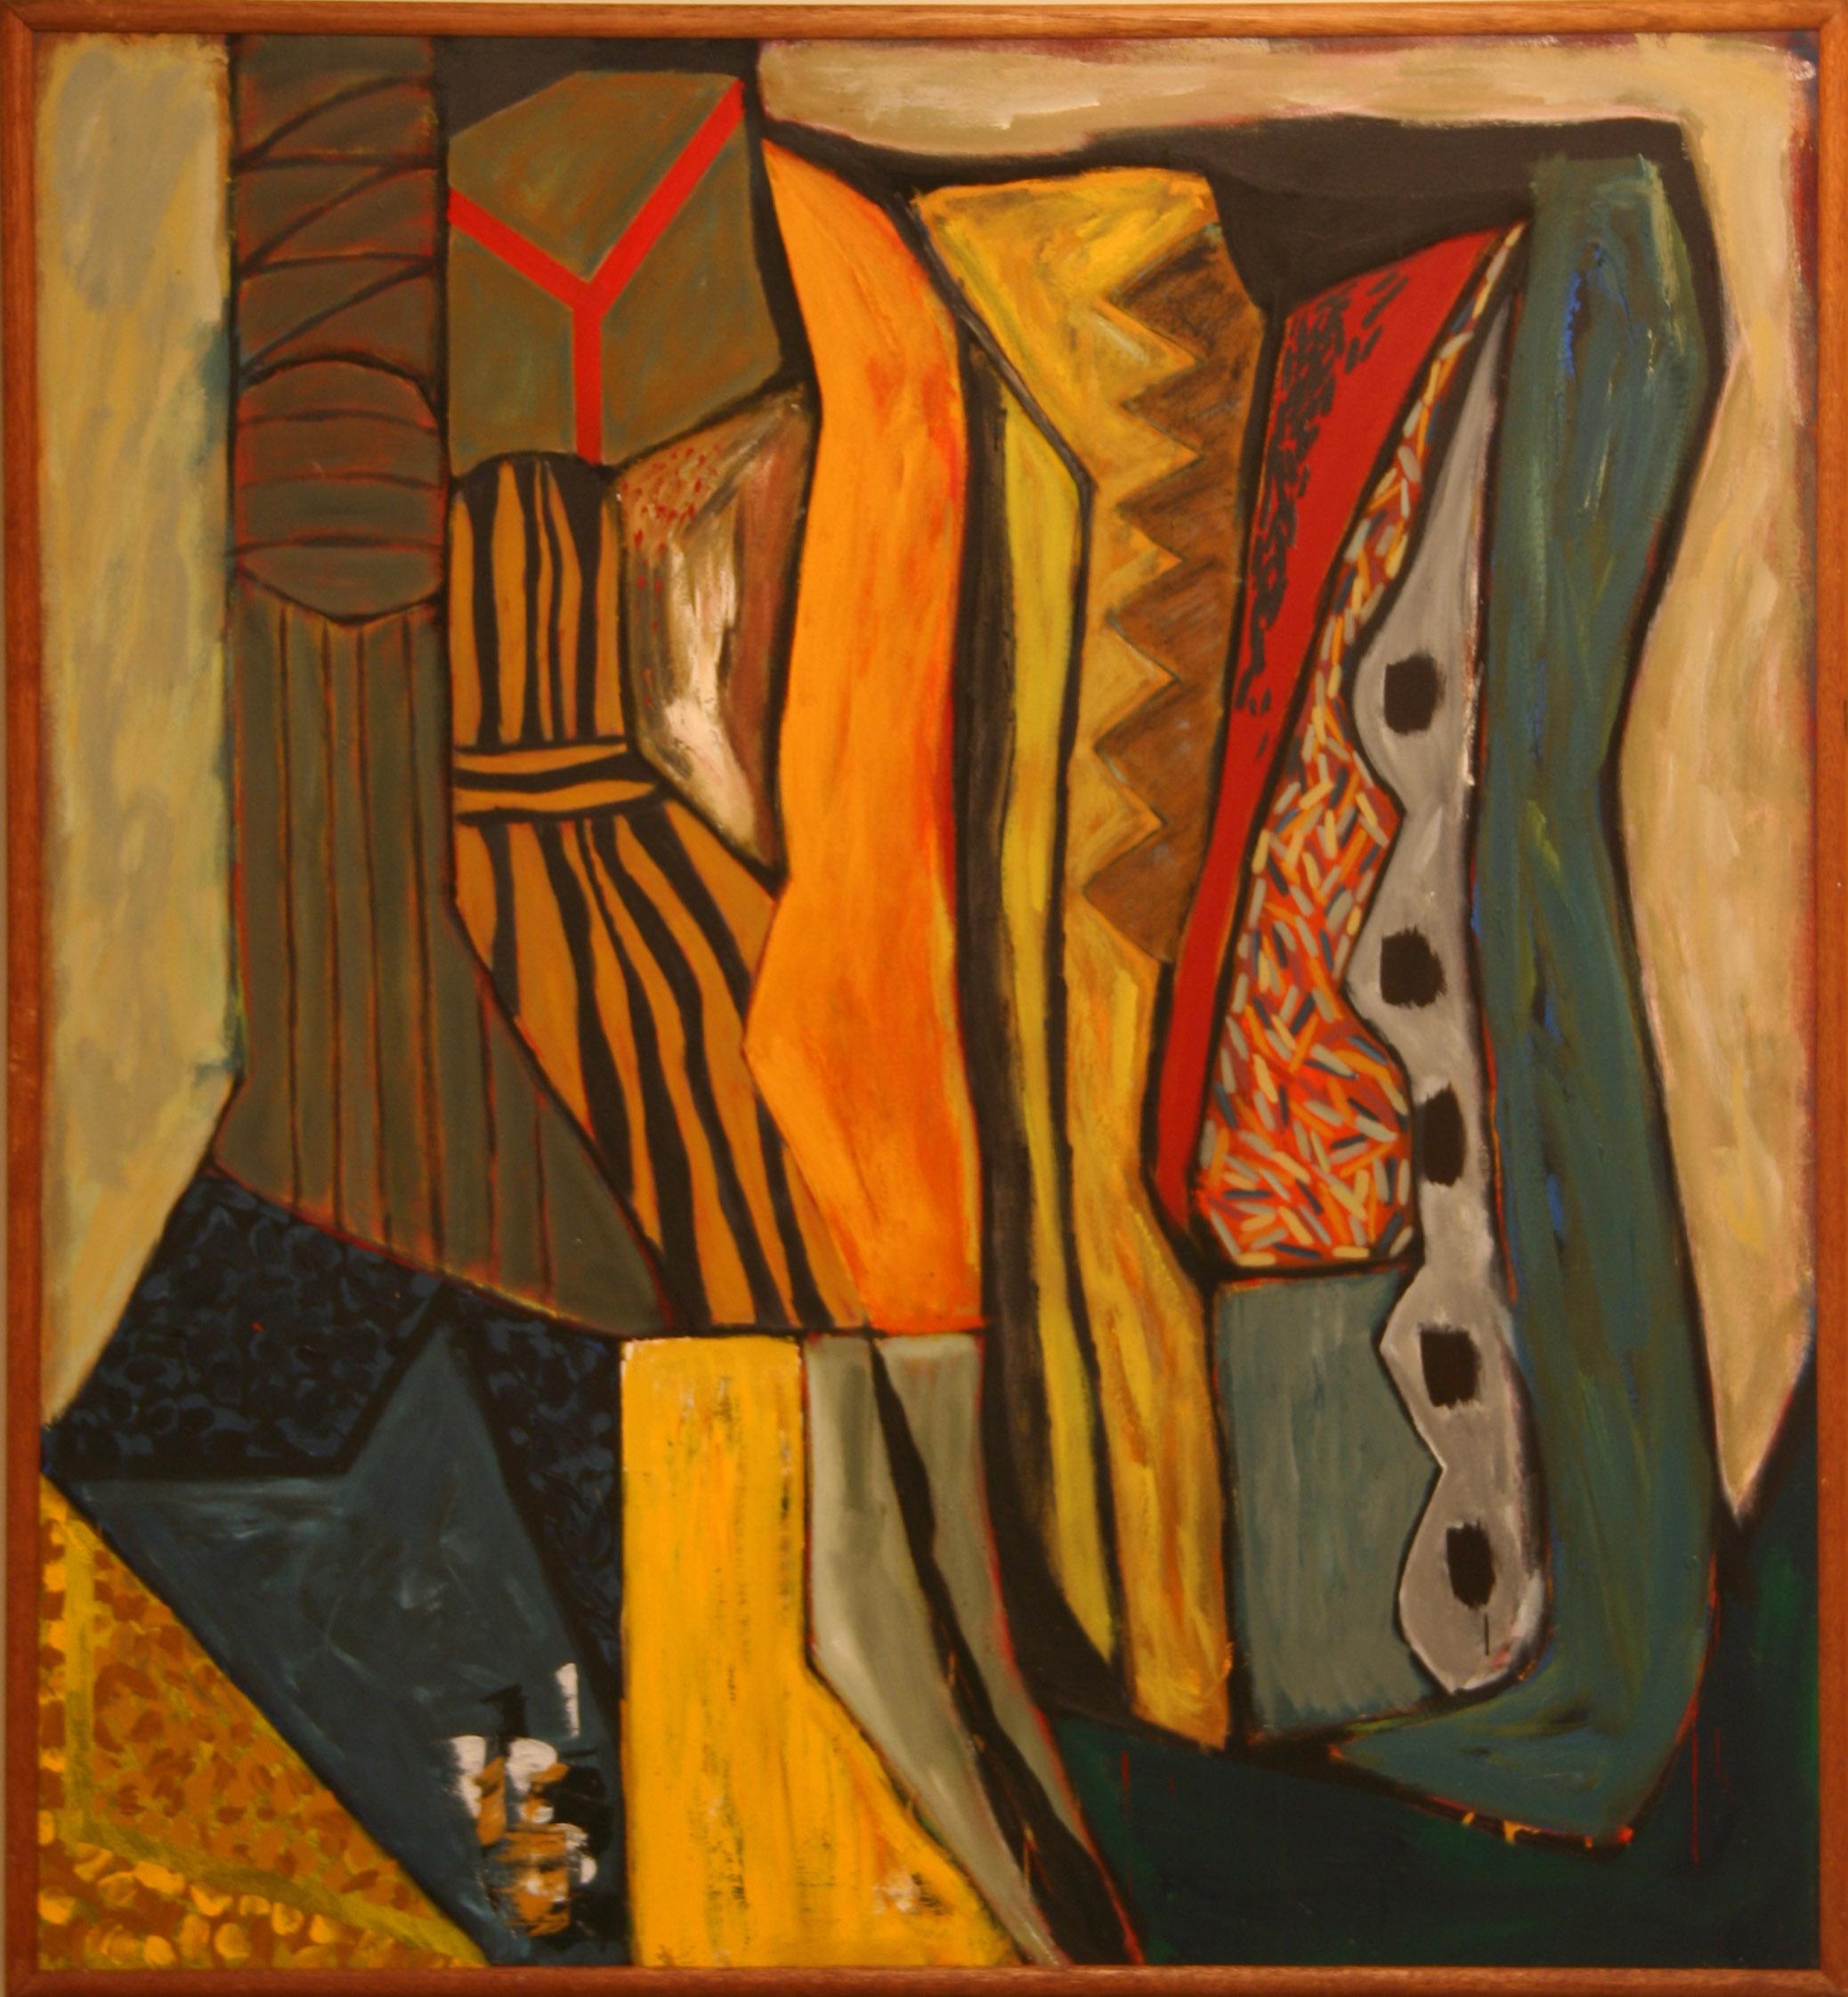 John Martin, Immigrant's Lament – the Hollow Man 1988, acrylic on canvas,185 x 170 cm